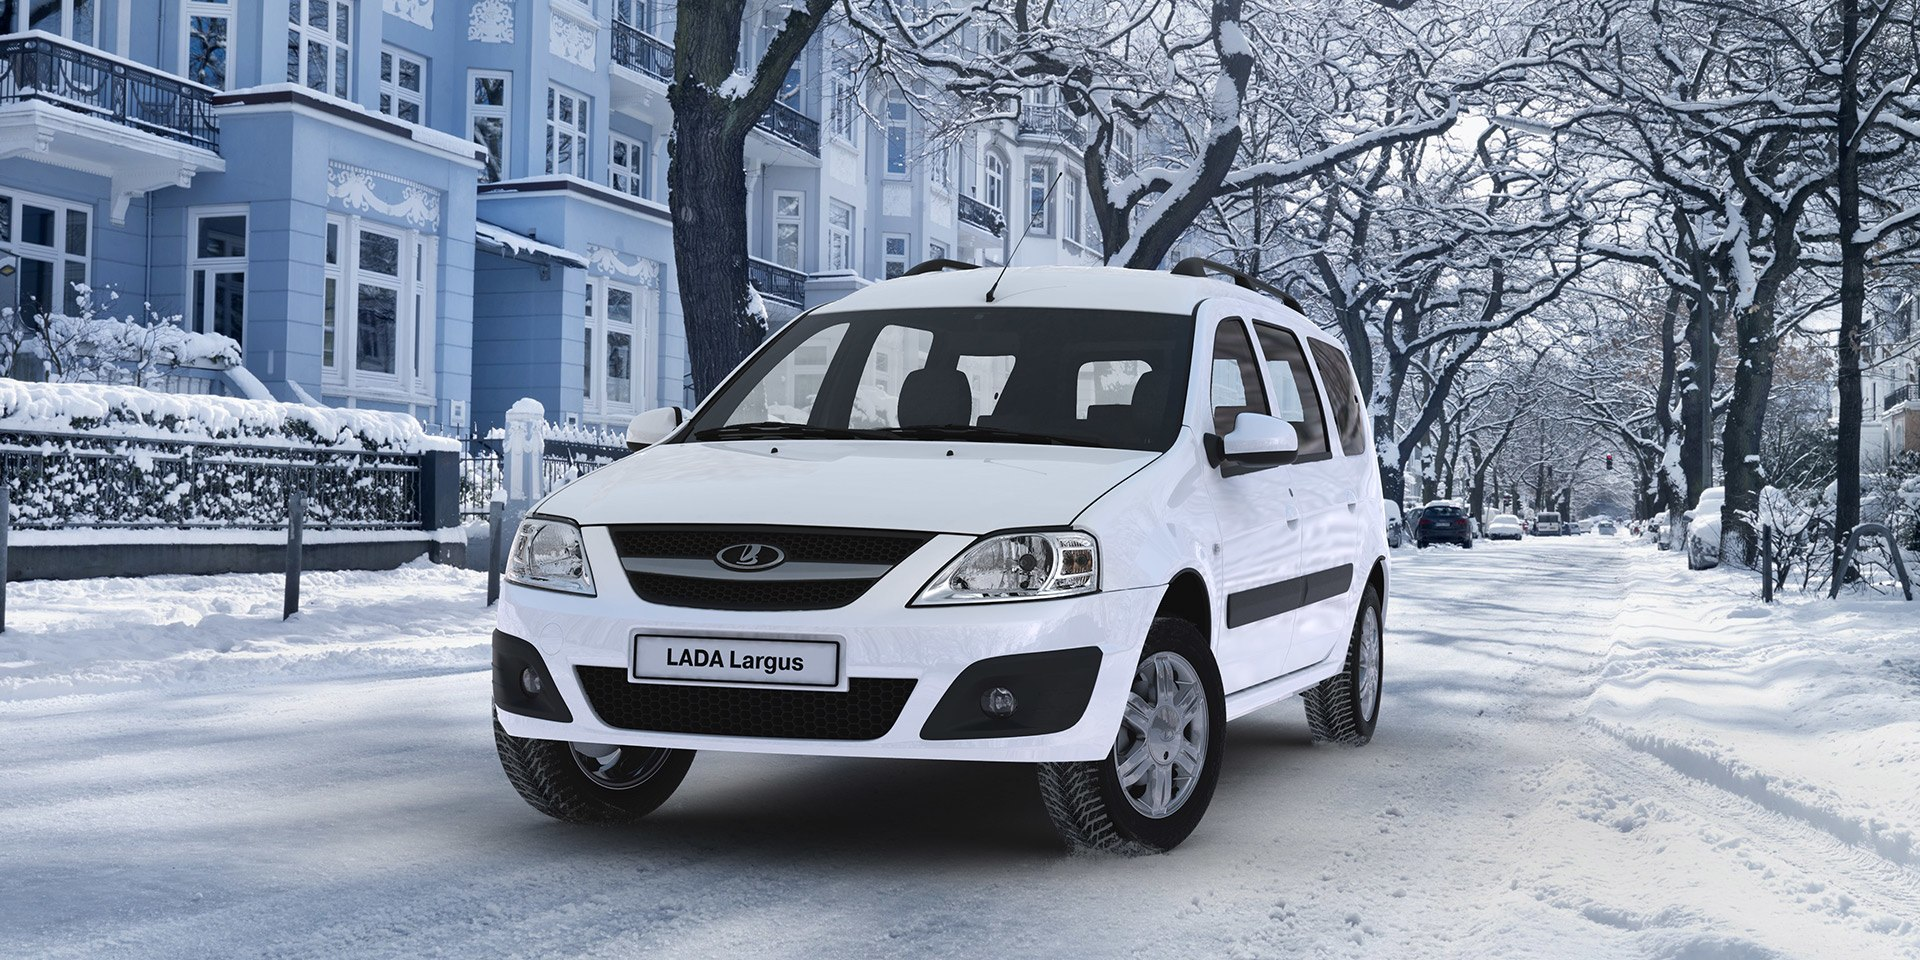 Новые модели ВАЗ 2019: фото, цена и характеристики авто, новинки Лада, старт продаж в России изоражения